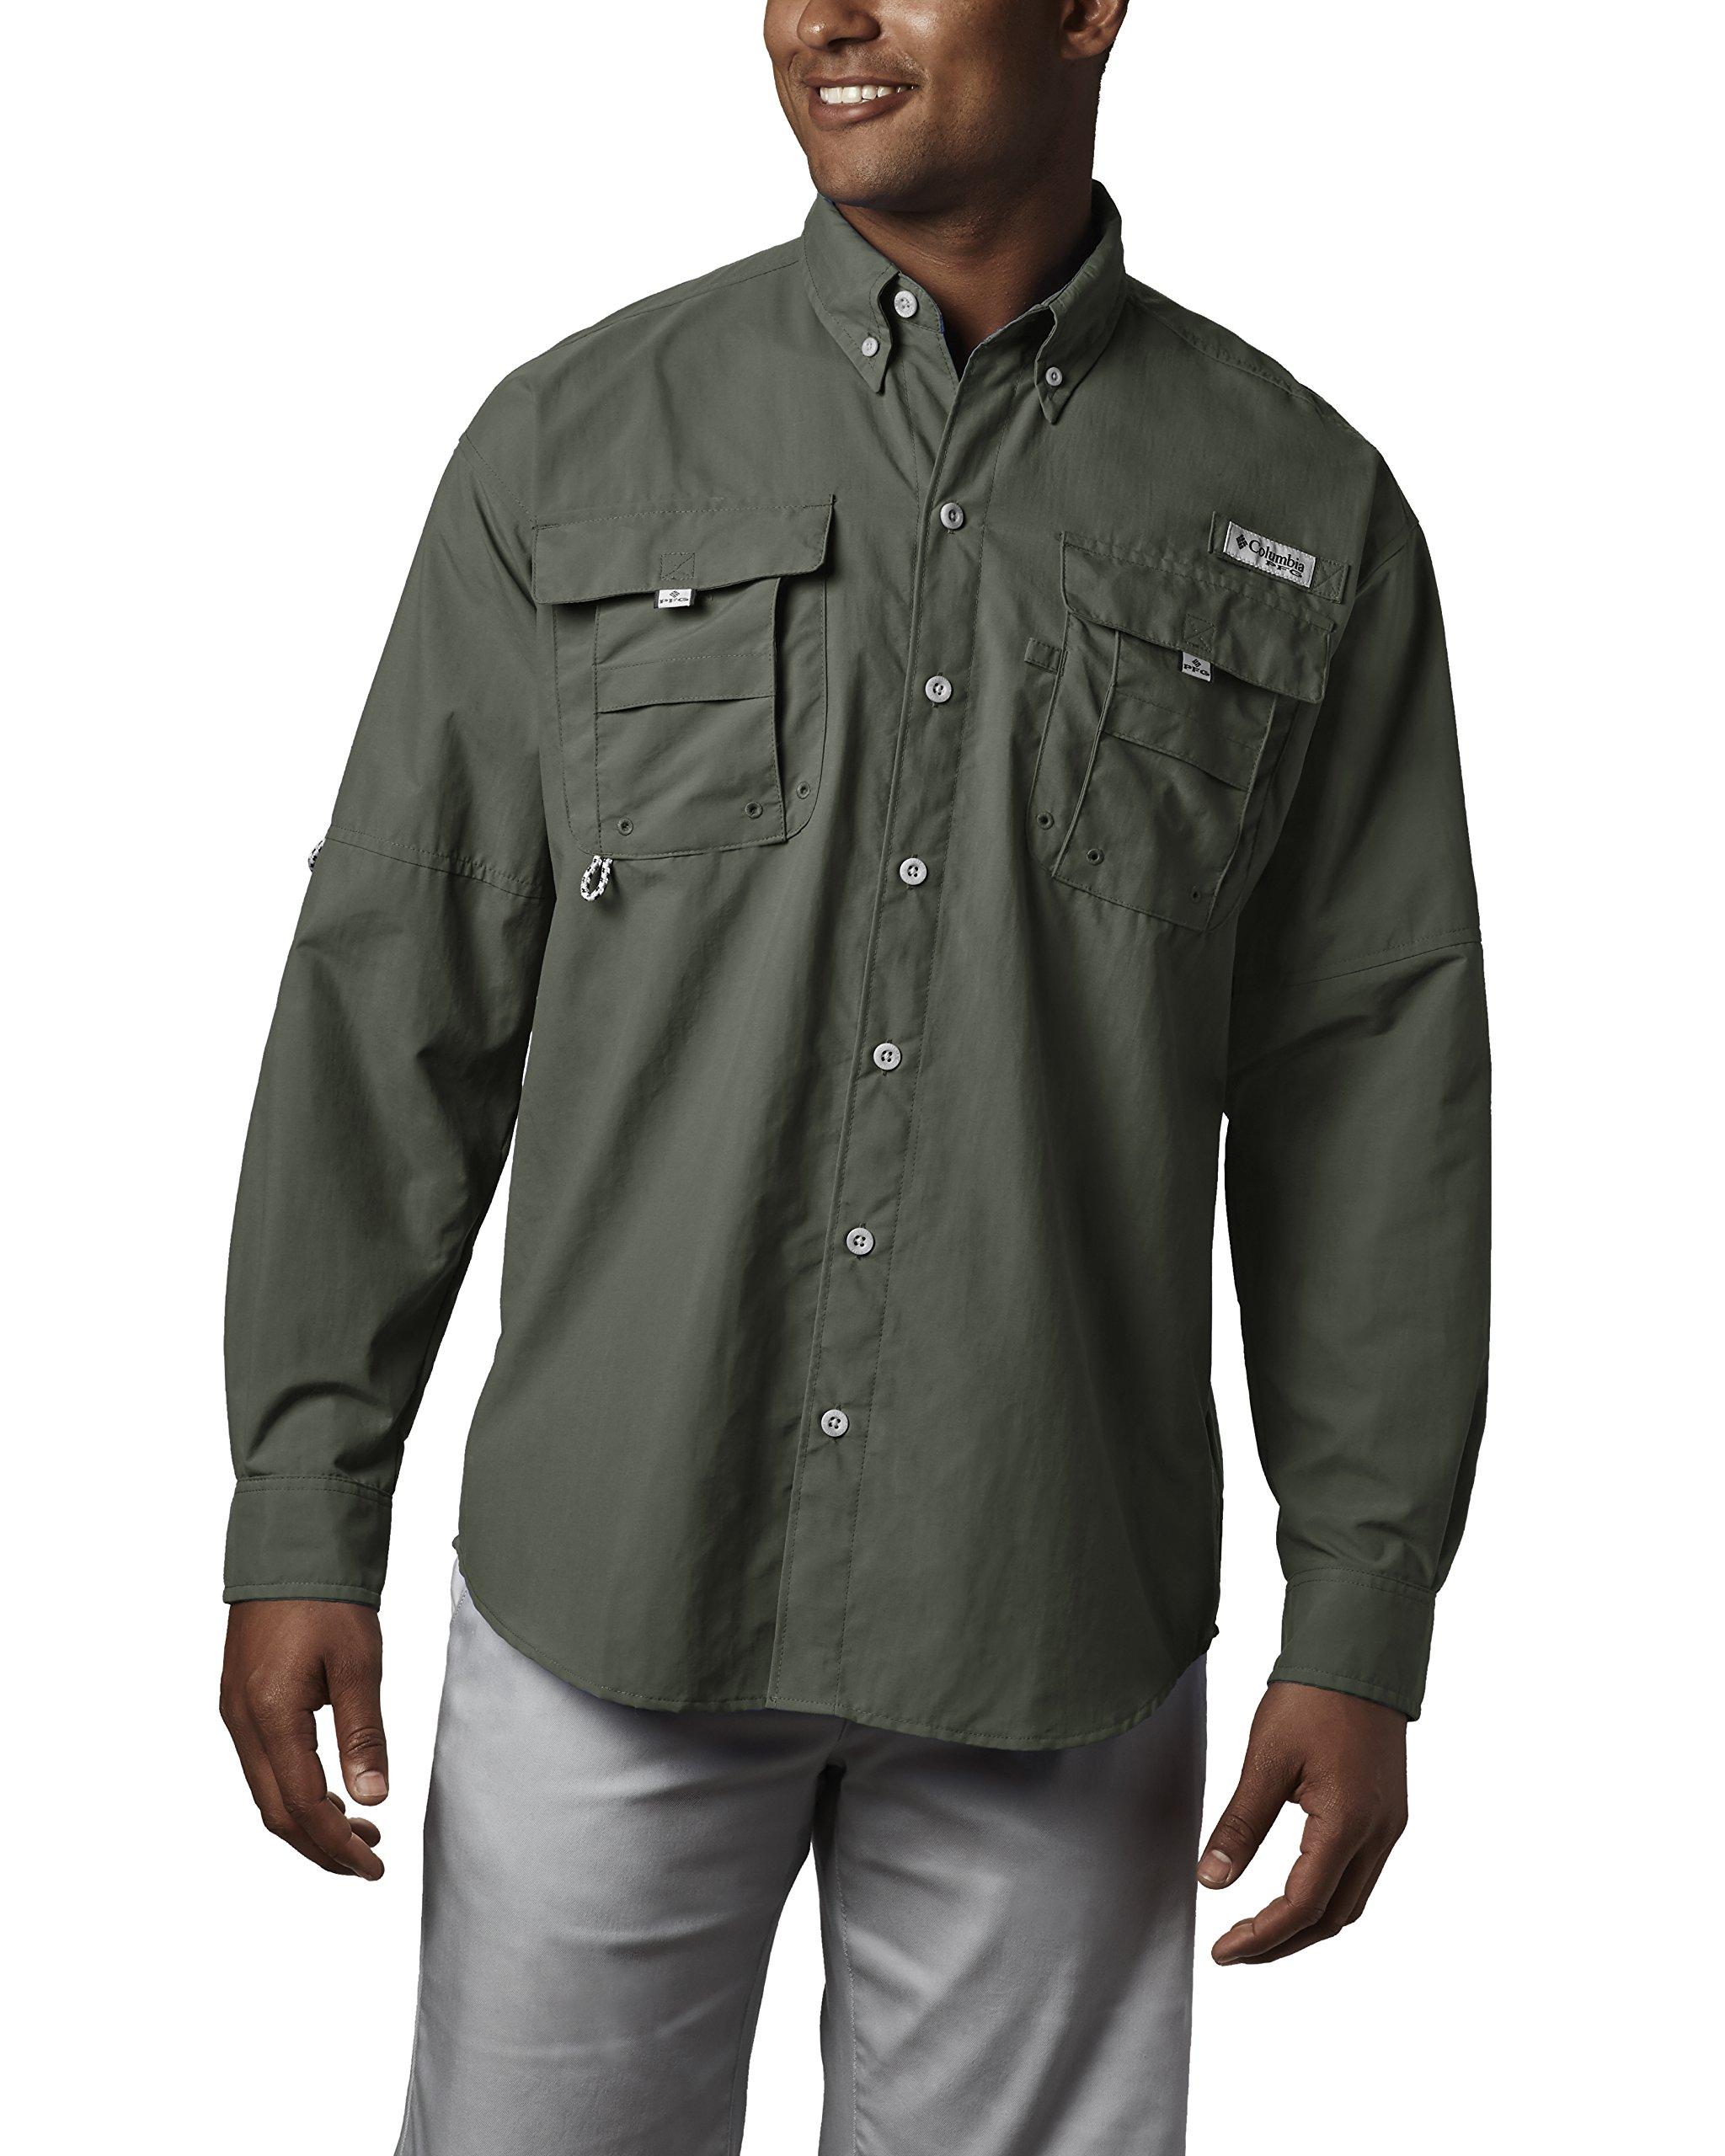 Columbia Men's Bahama II Long Sleeve Shirt, Cypress, Large by Columbia